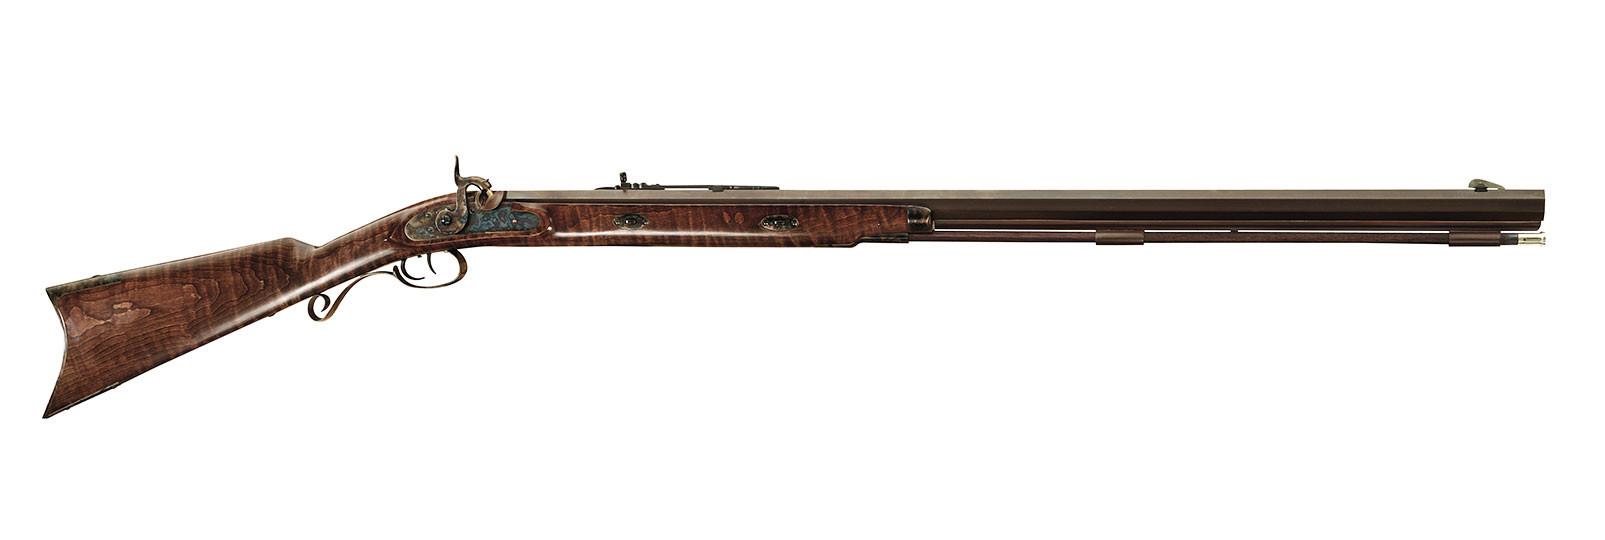 "Rocky Mountain Hawken ""maple"" Rifle"